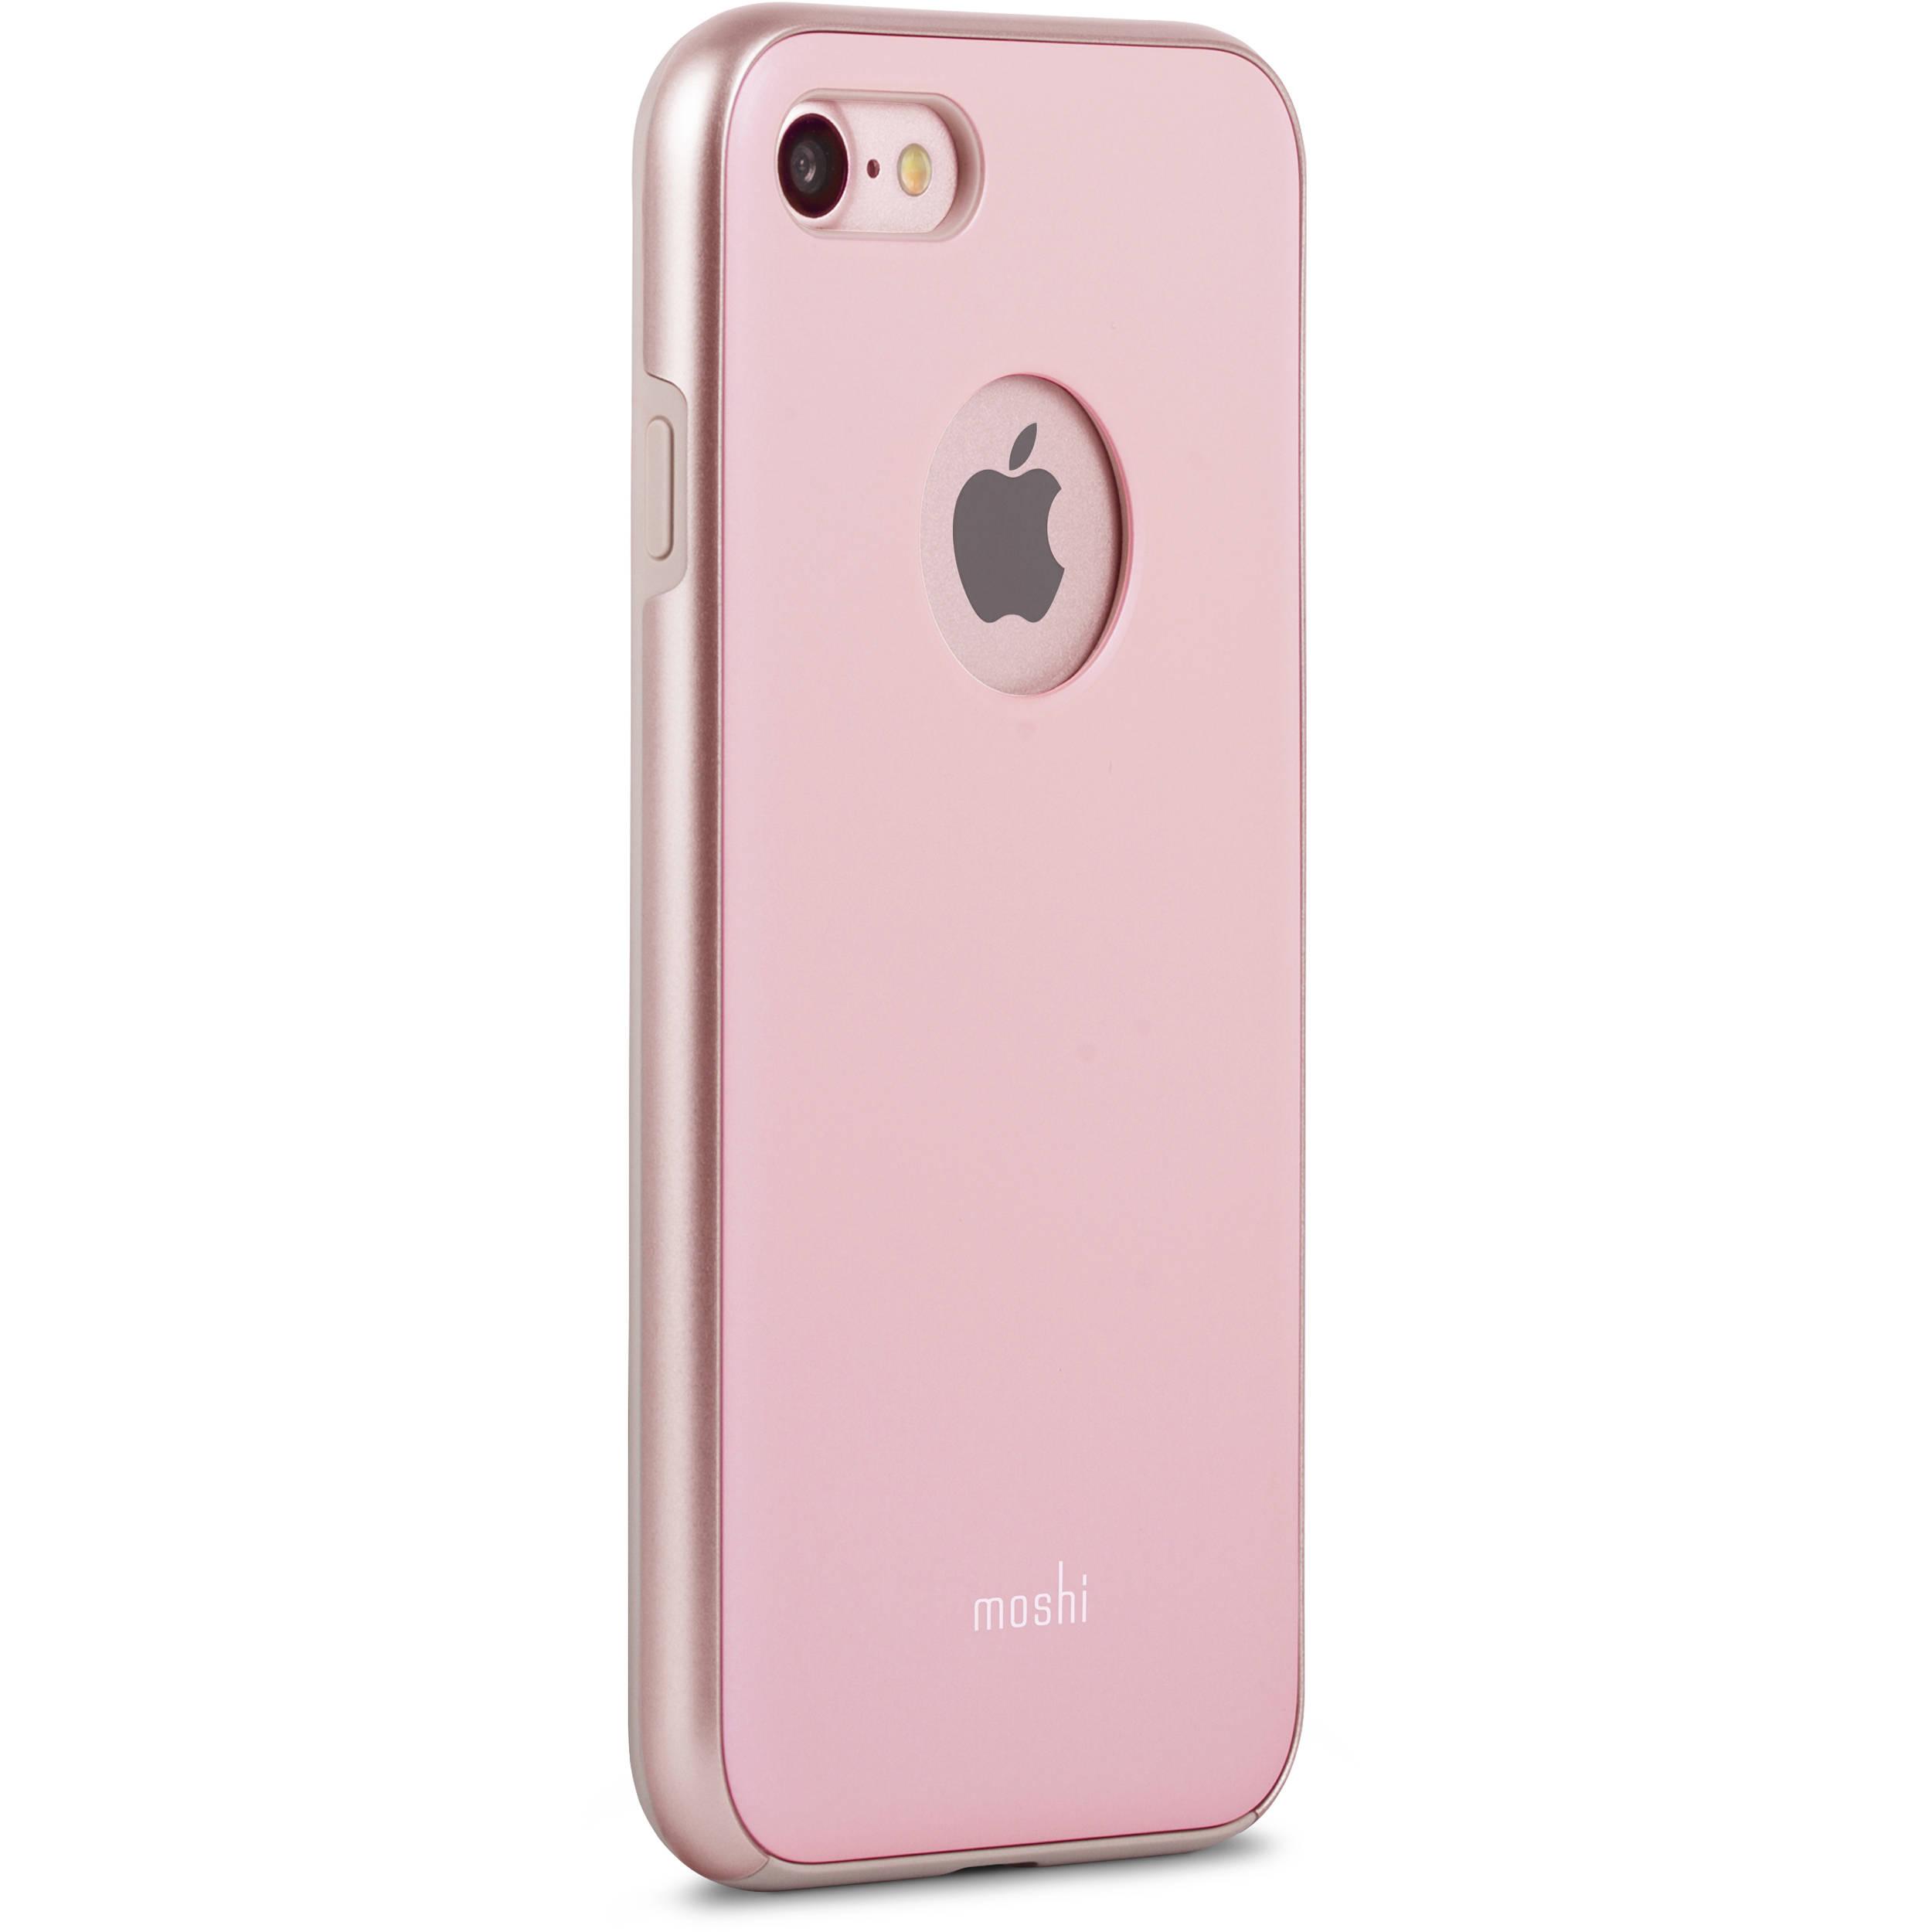 moshi iglaze case for iphone 7 pink 99mo088301 b h photo video. Black Bedroom Furniture Sets. Home Design Ideas